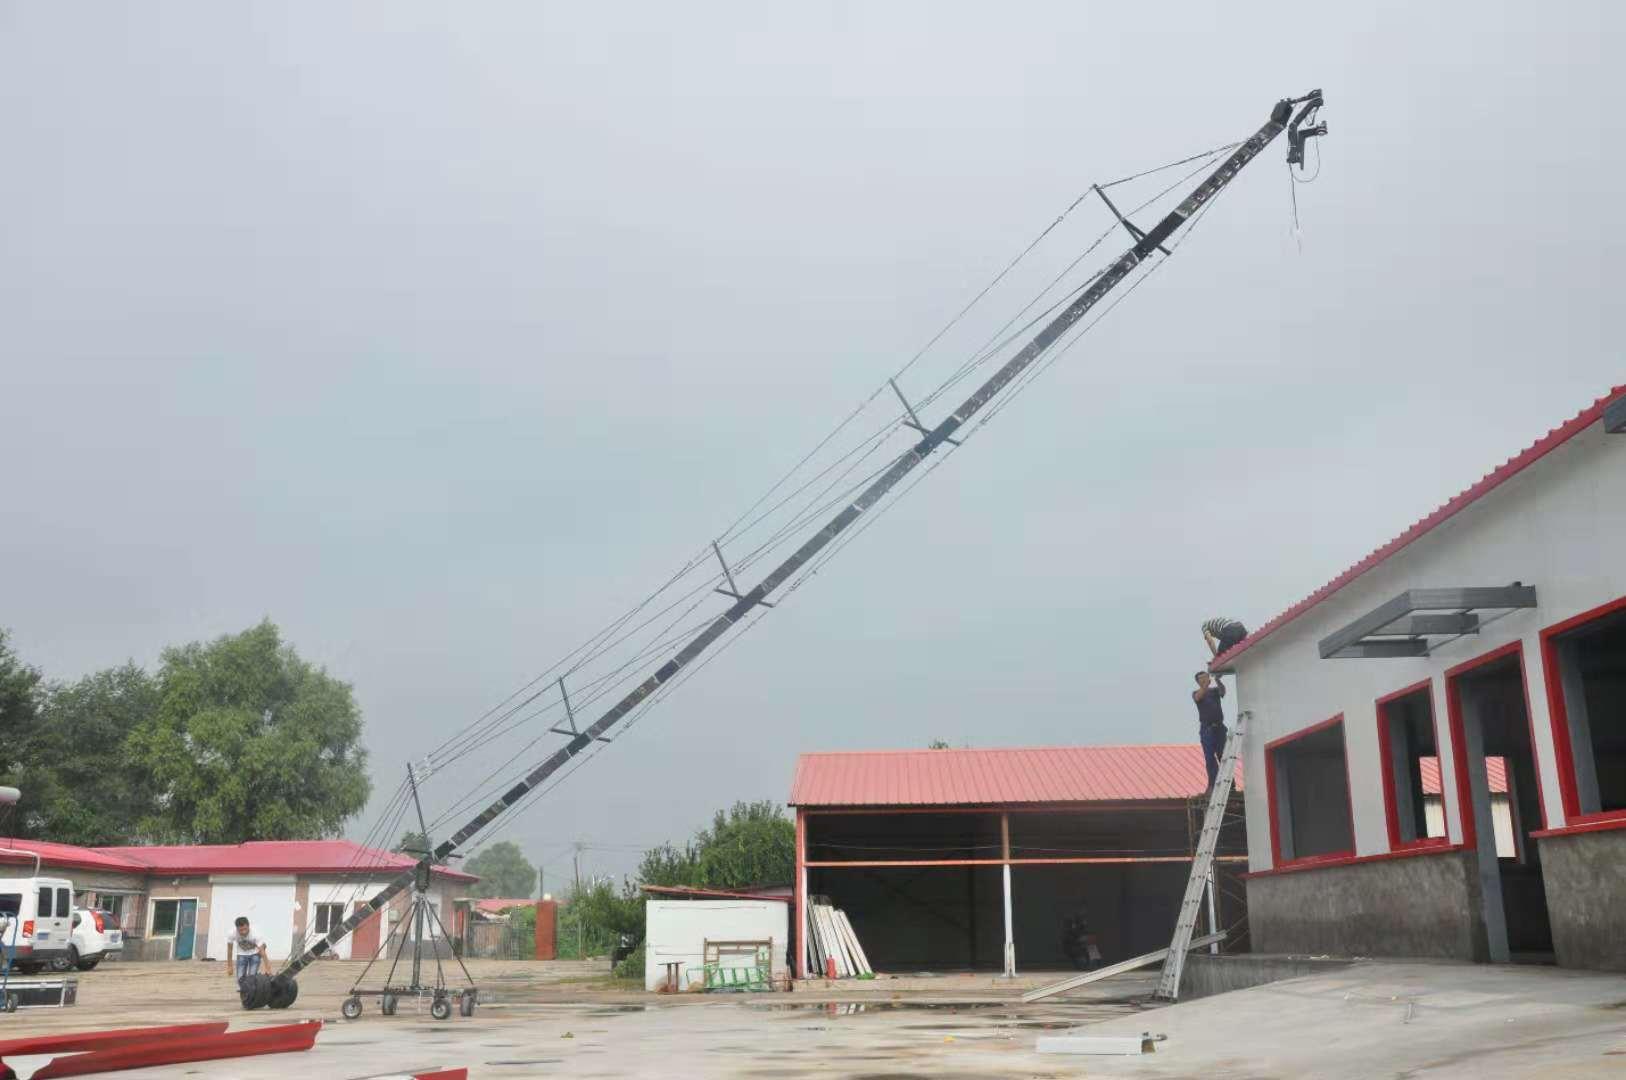 video crane,longest camera crane,2019 big discount